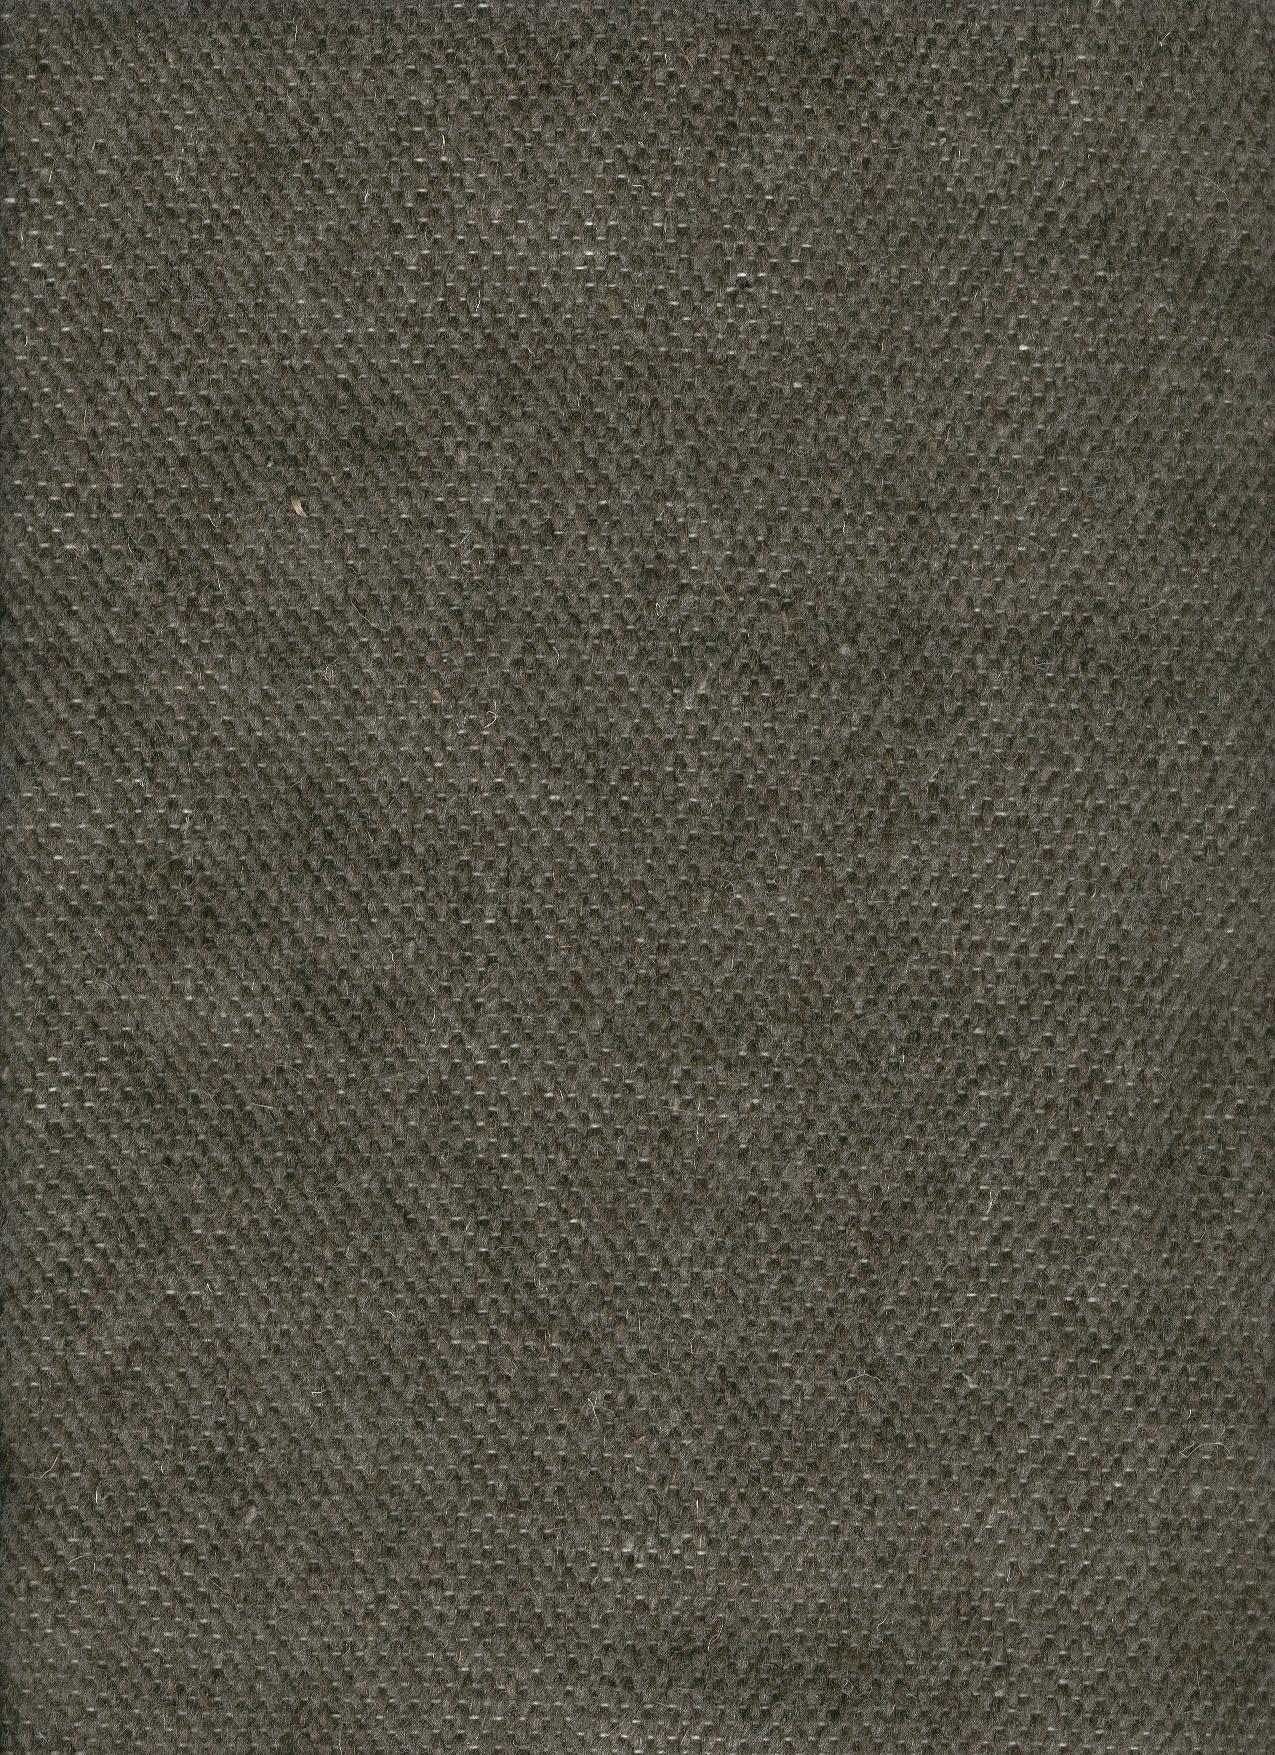 Brown Burlap Fibrous Texture